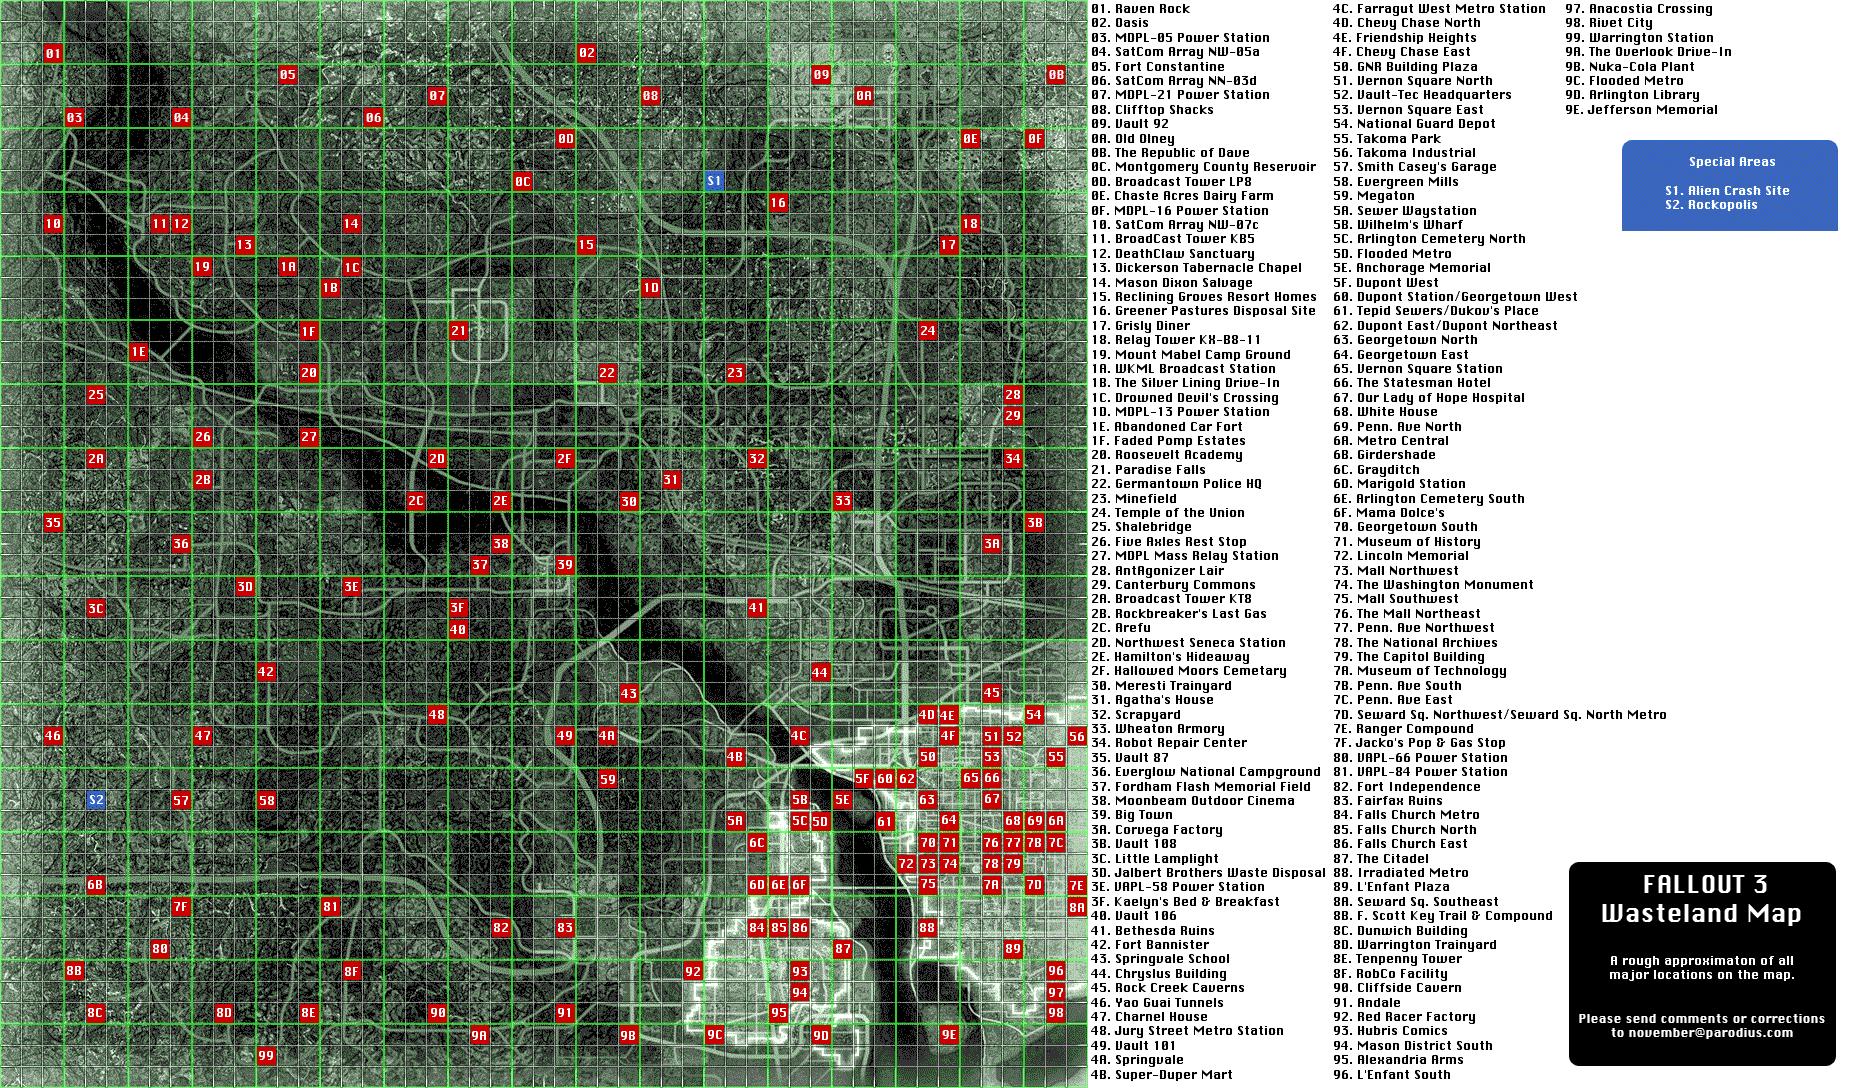 Wastelandmap.png